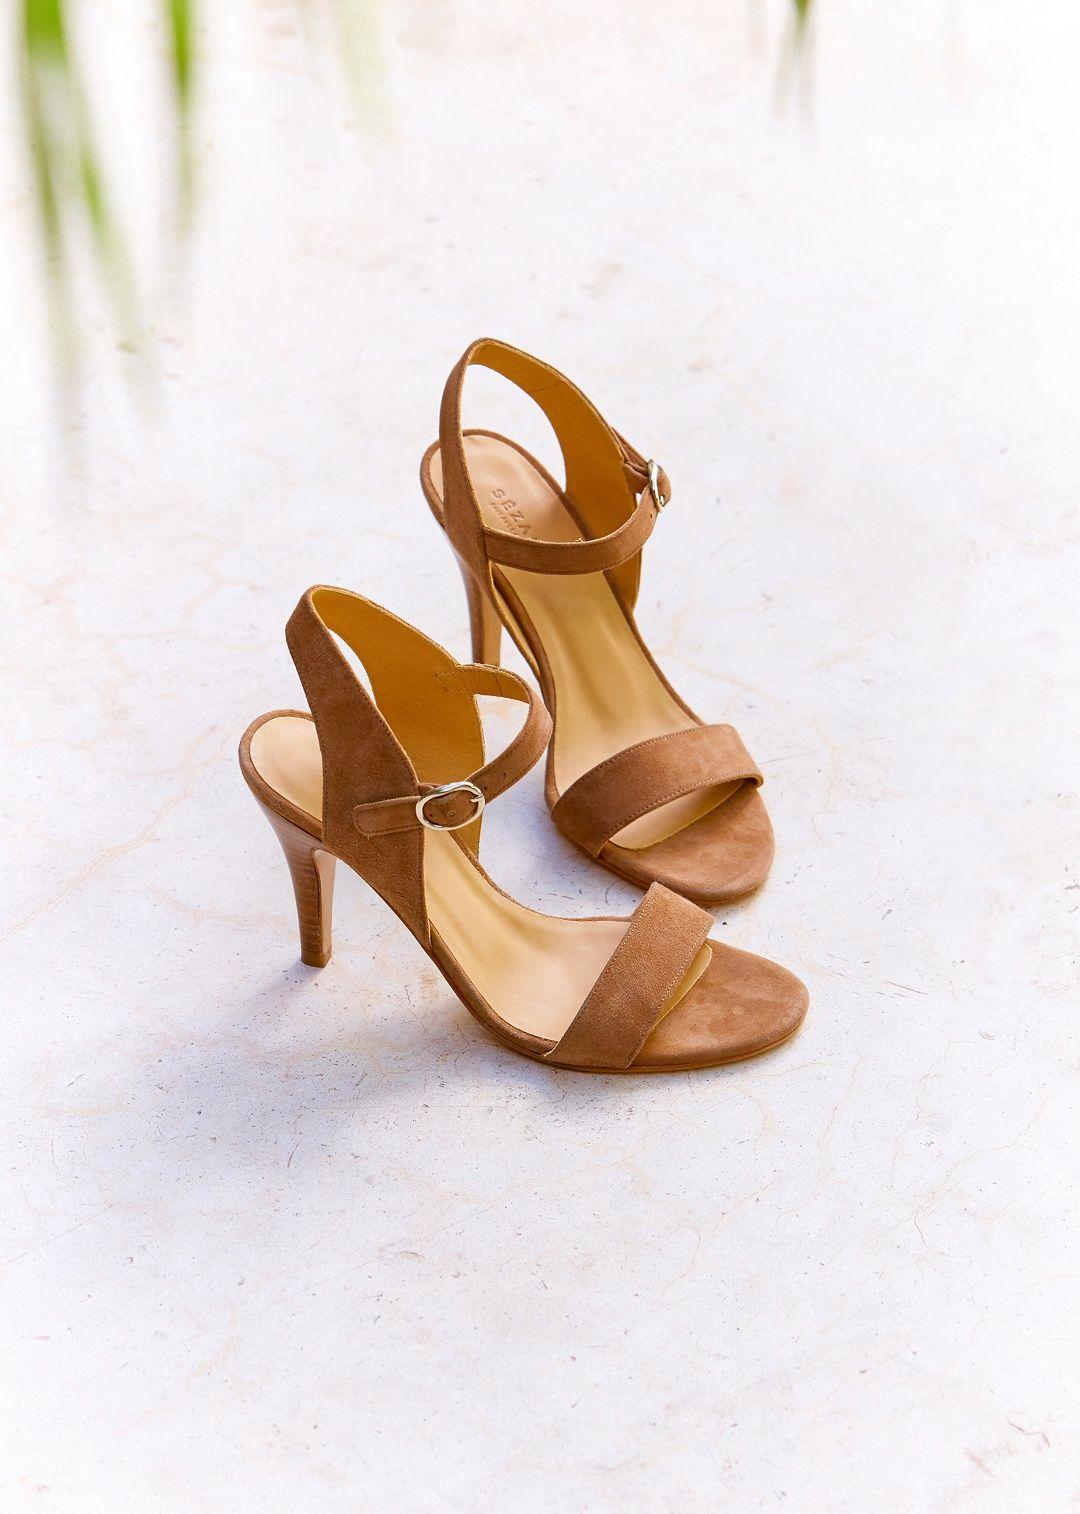 34c9b09b68e0 Sézane - Sandales High Kelly | shoes | Sezane chaussures, Chaussures ...